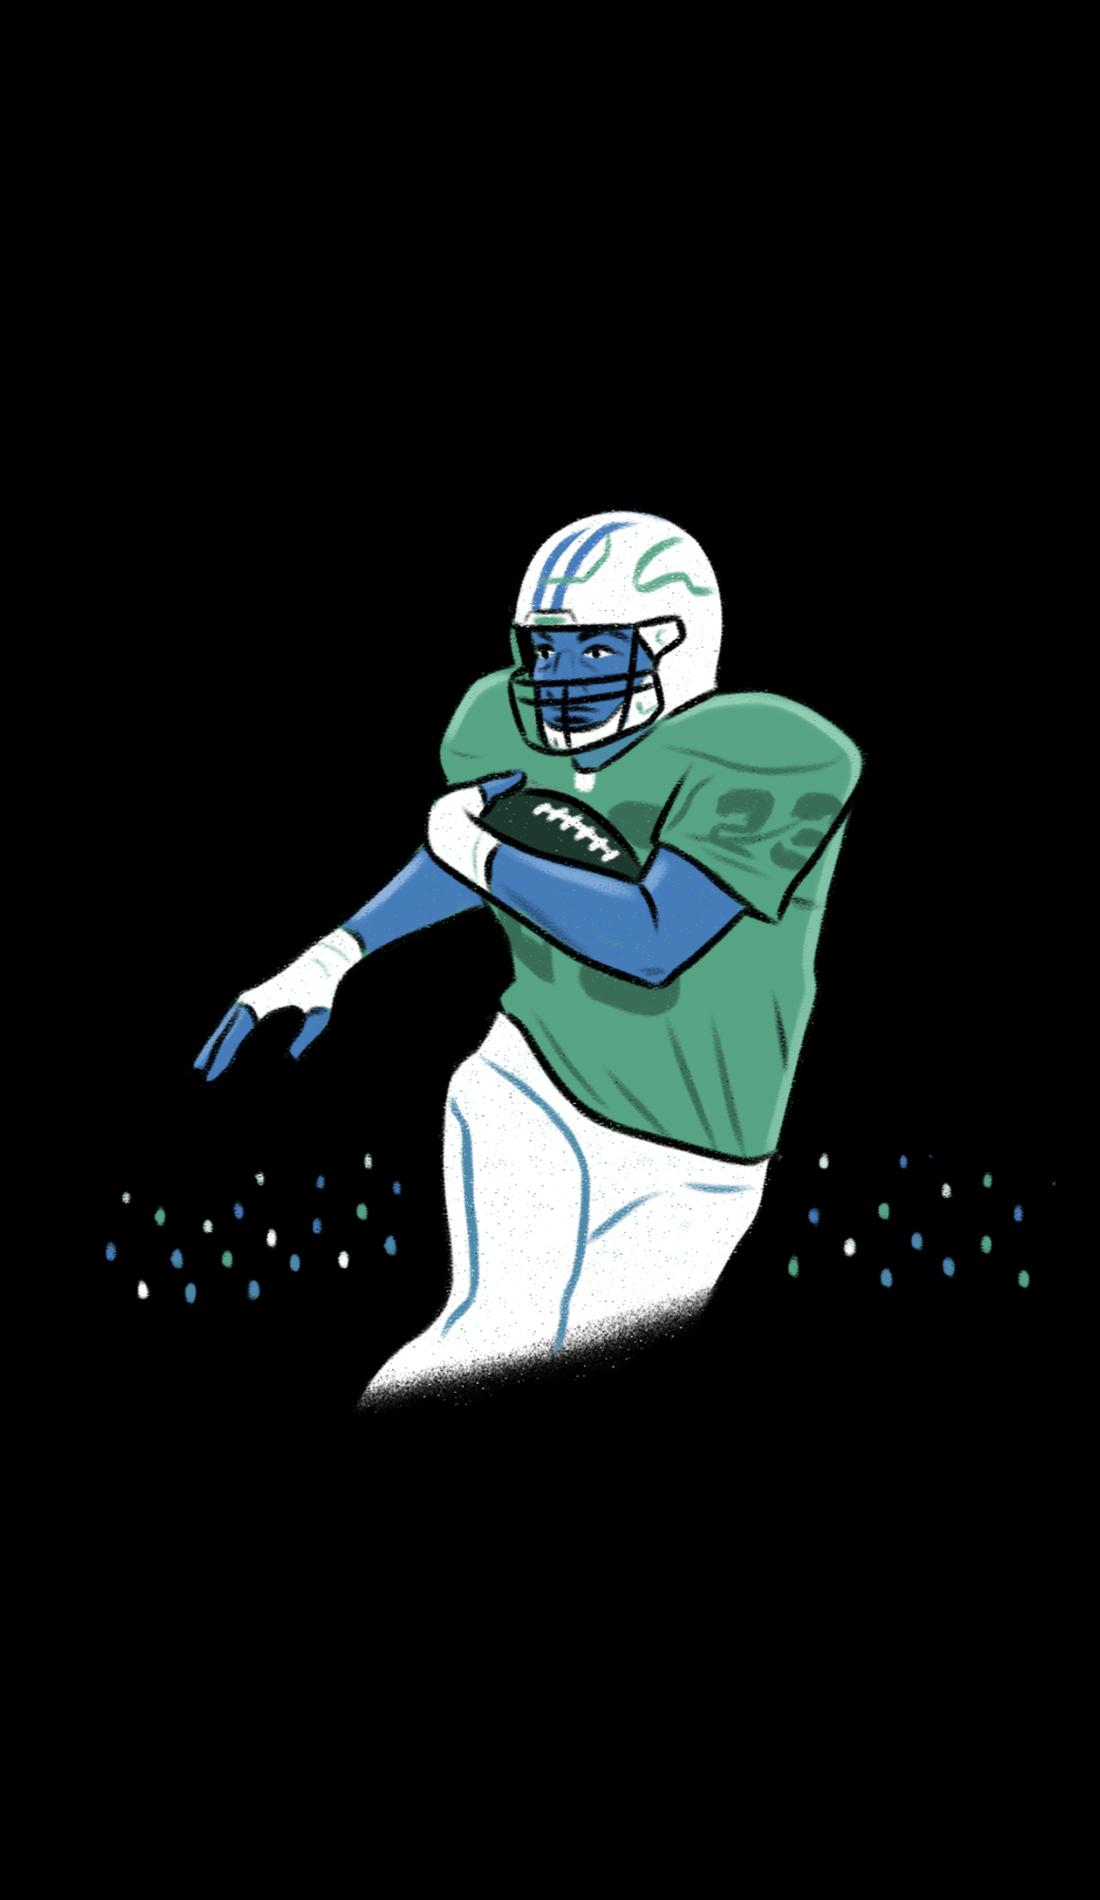 A Alabama A&M Bulldogs Football live event